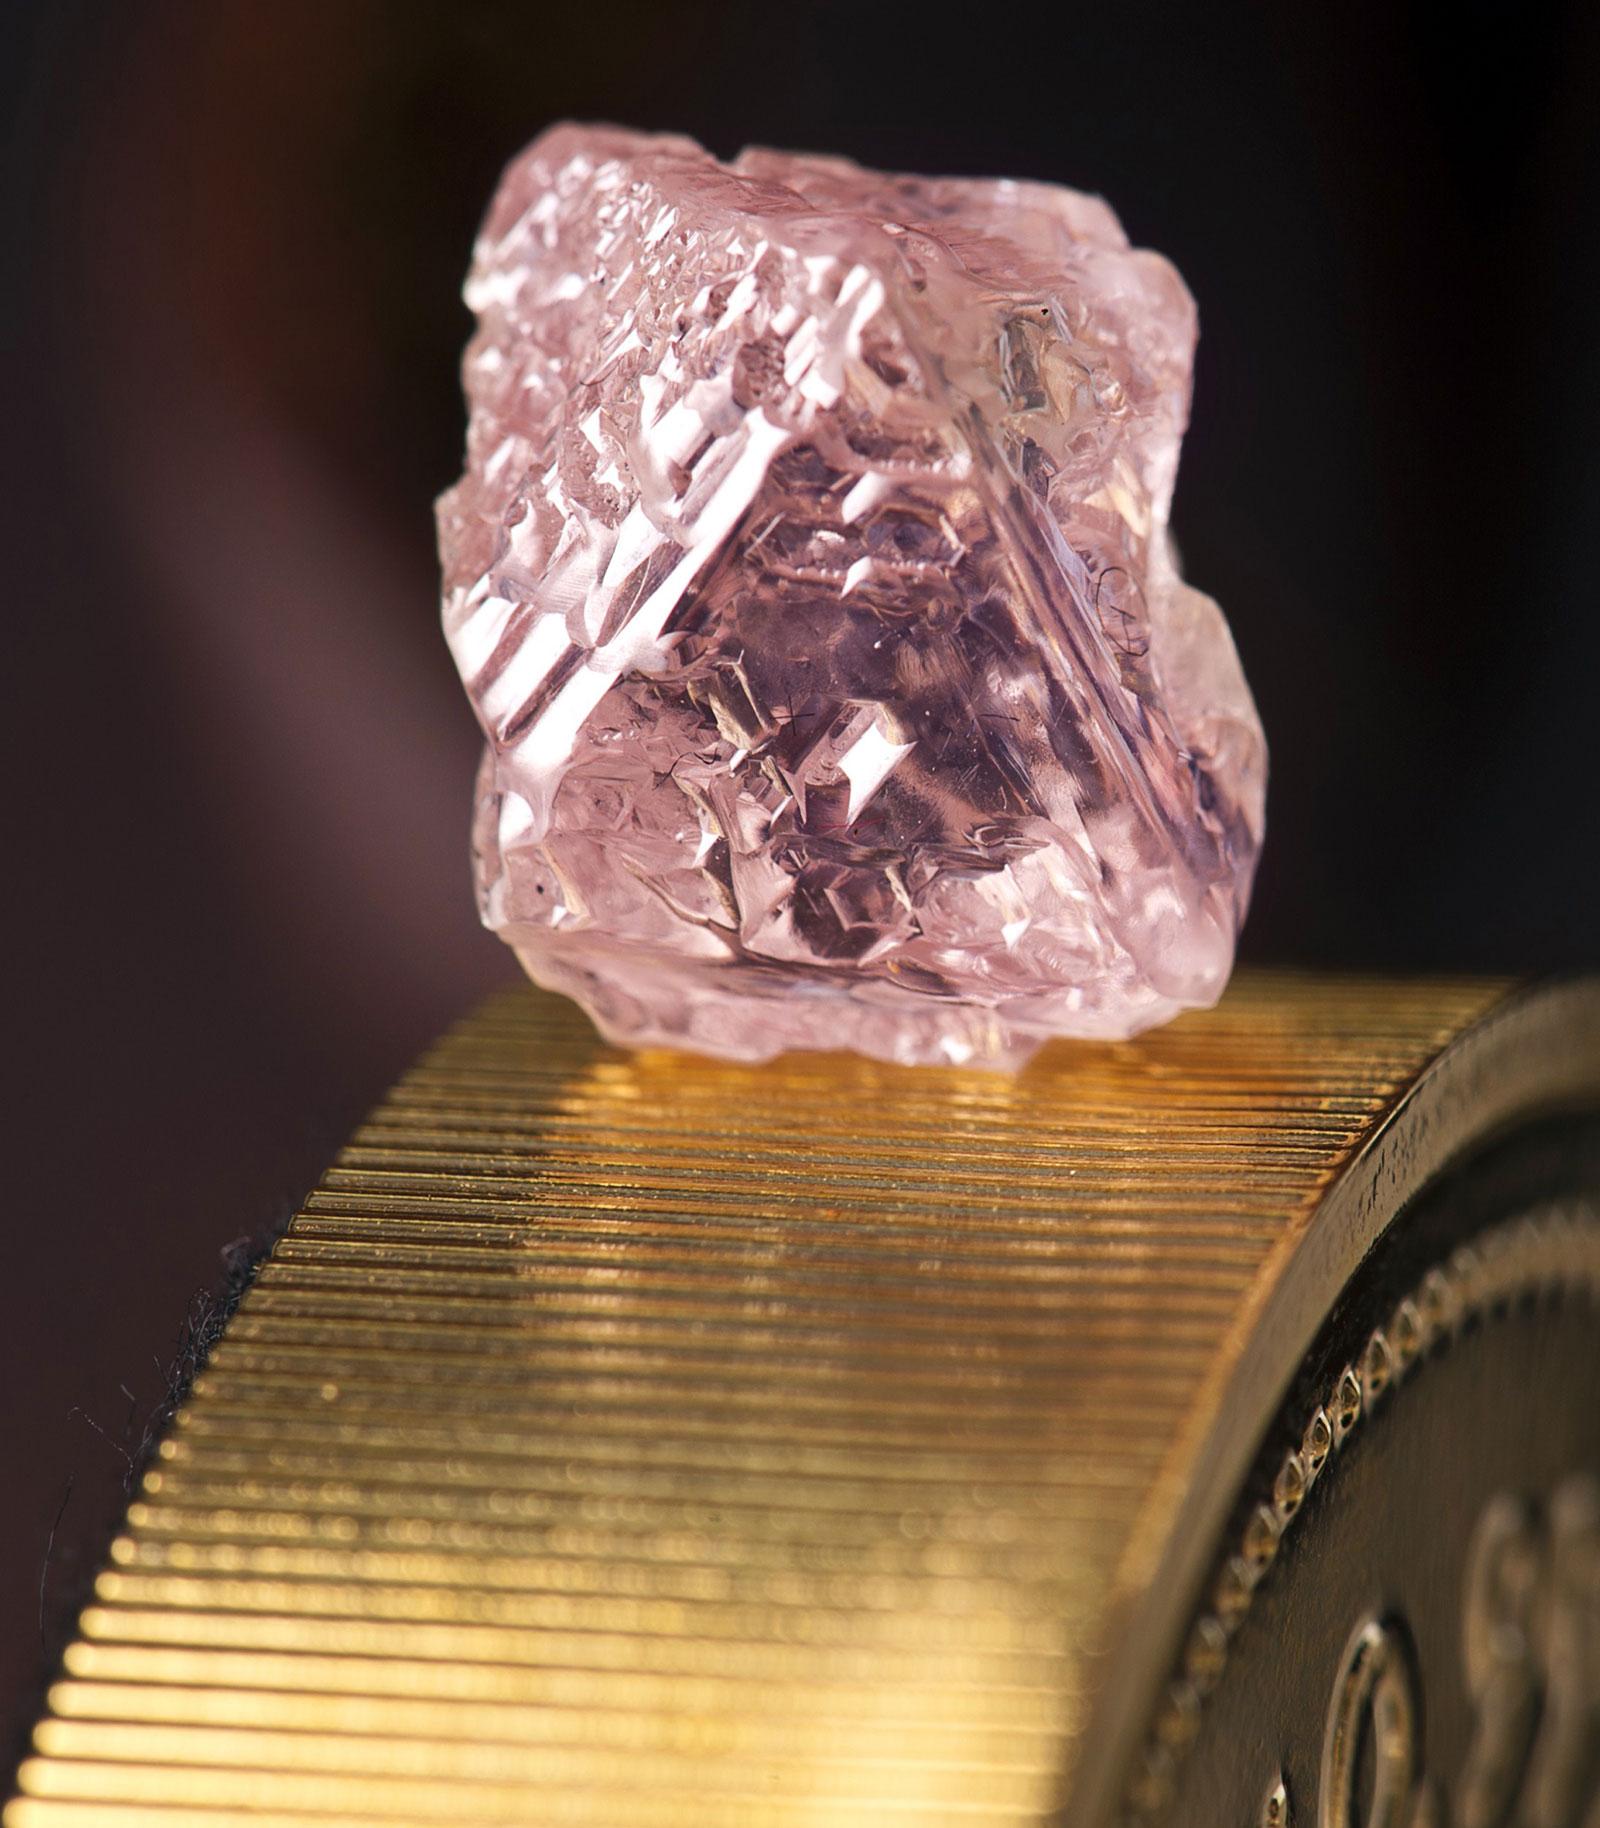 12 76 Carats Rare Pink Diamond Found In Australia